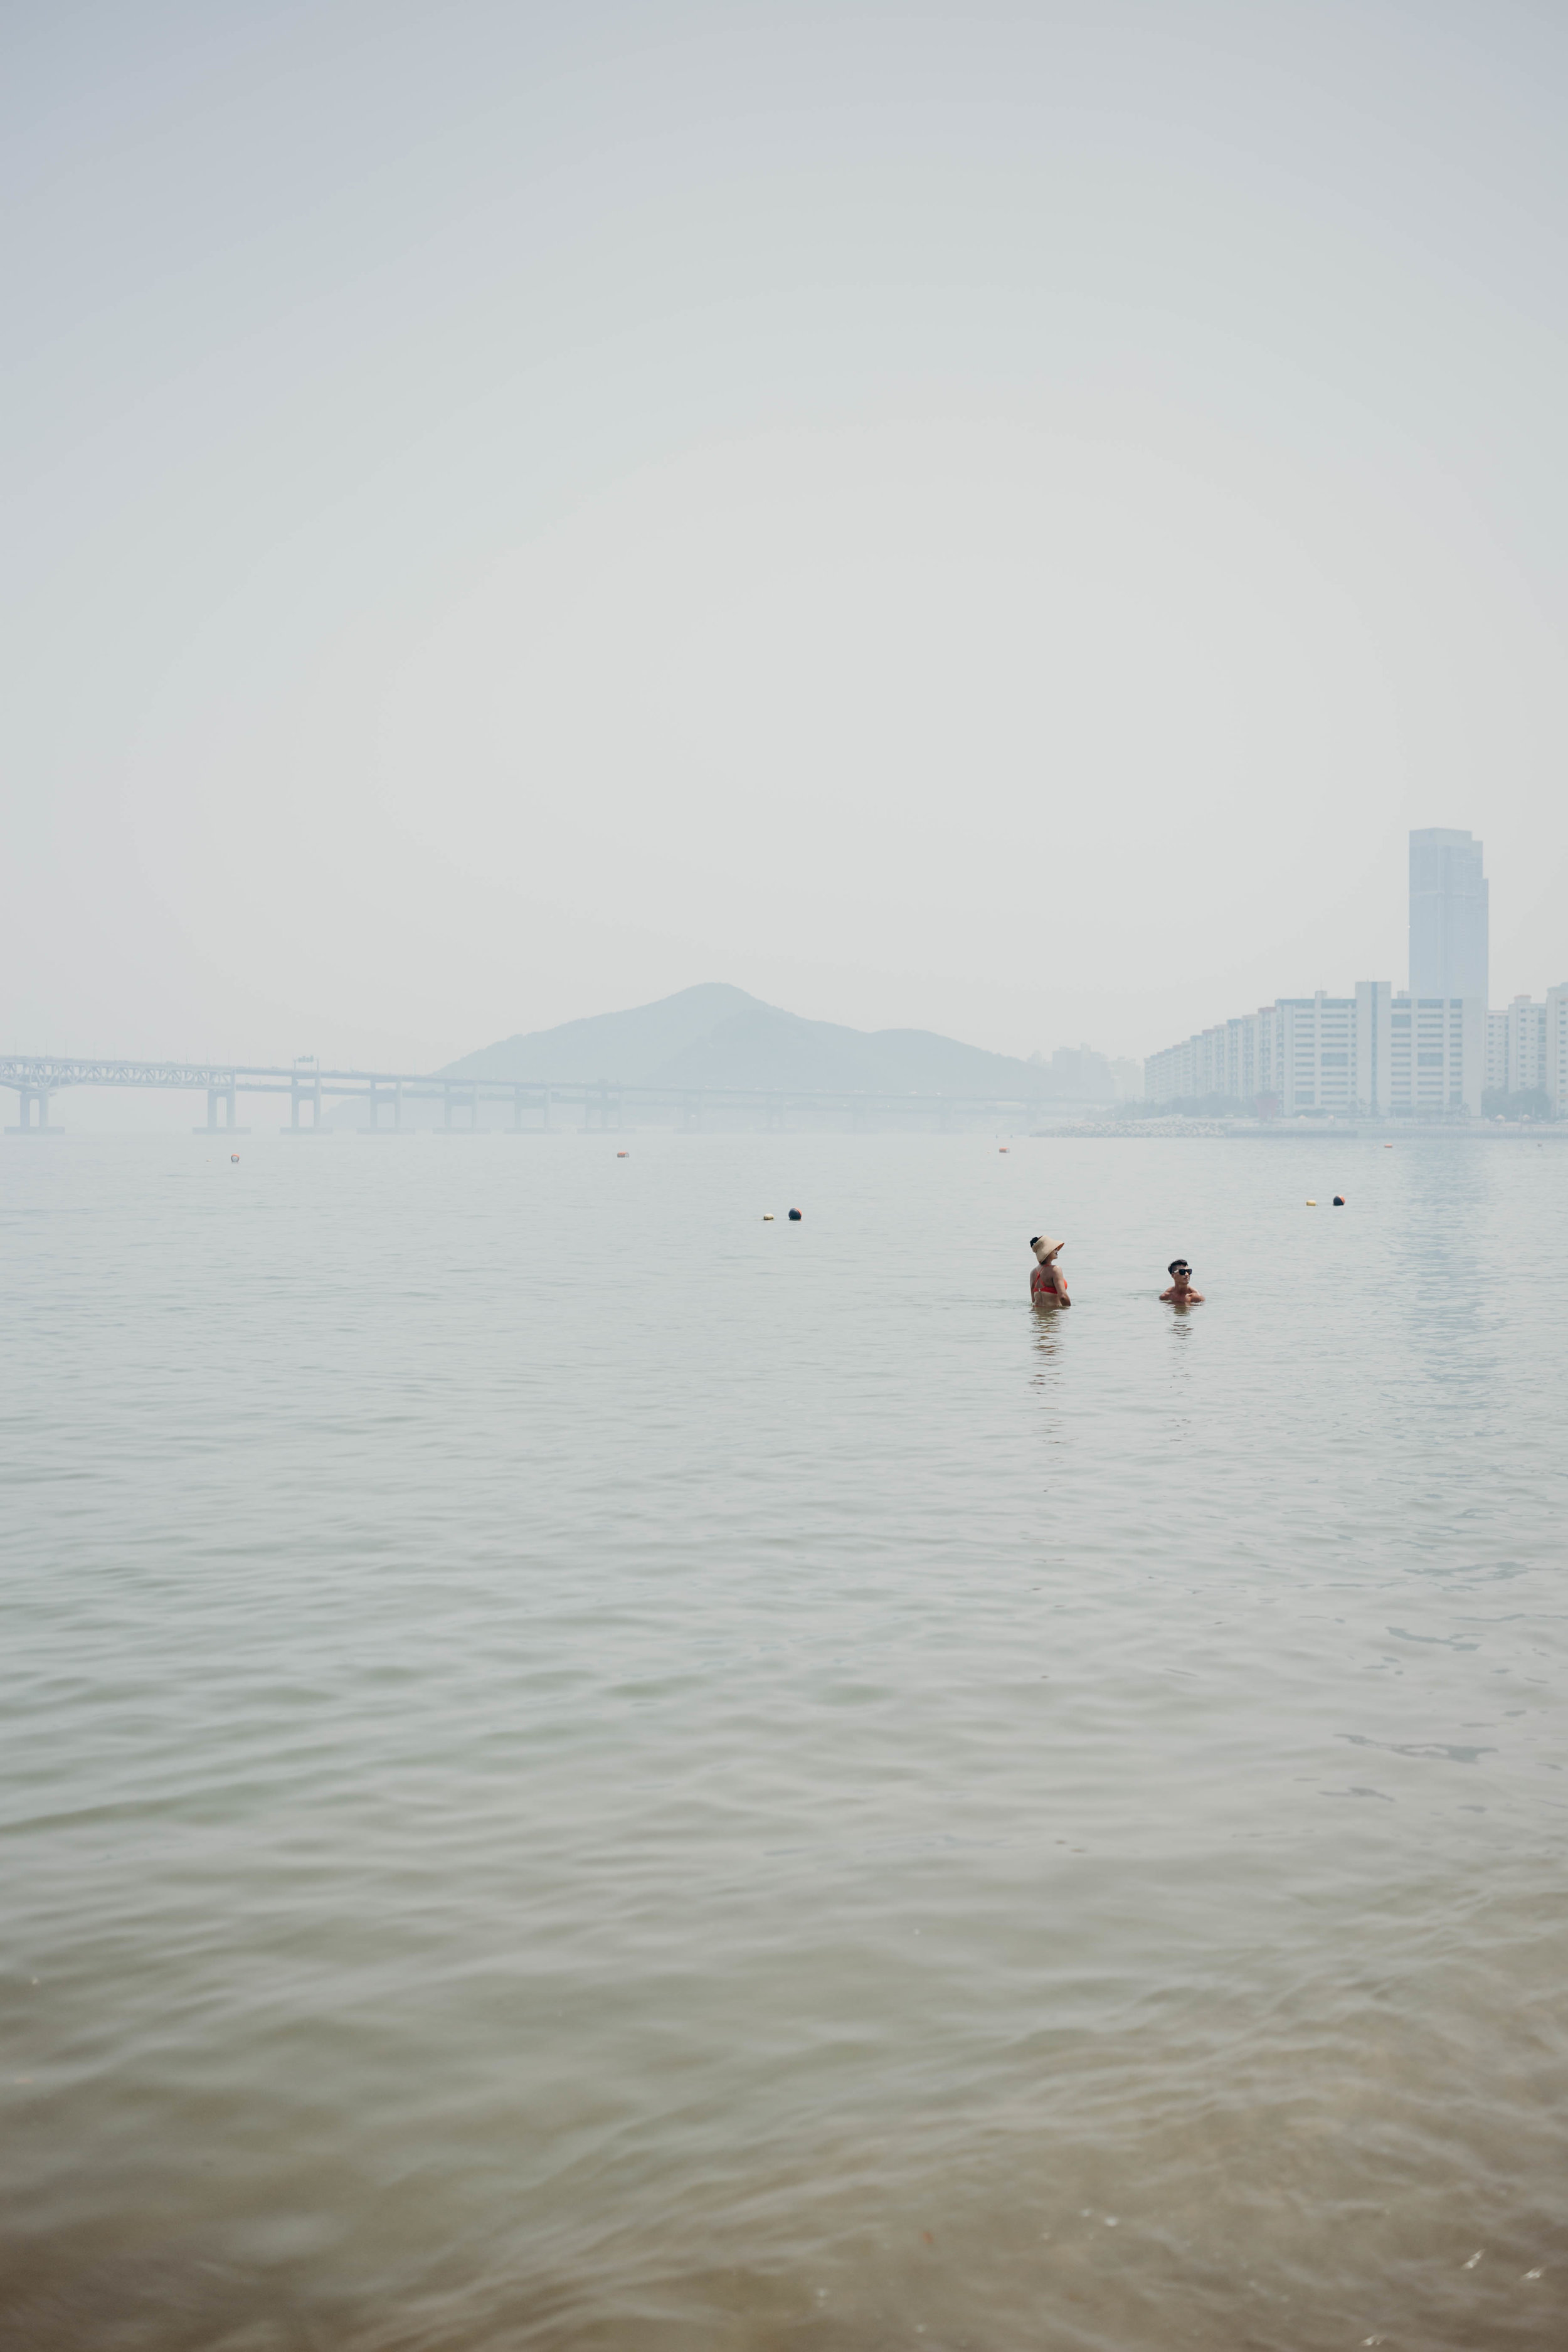 On Travel   On the Street Where We Live (aretherelilactrees.com)  Busan, South Korea, Gwangalli Beach, Gwangalli Bridge